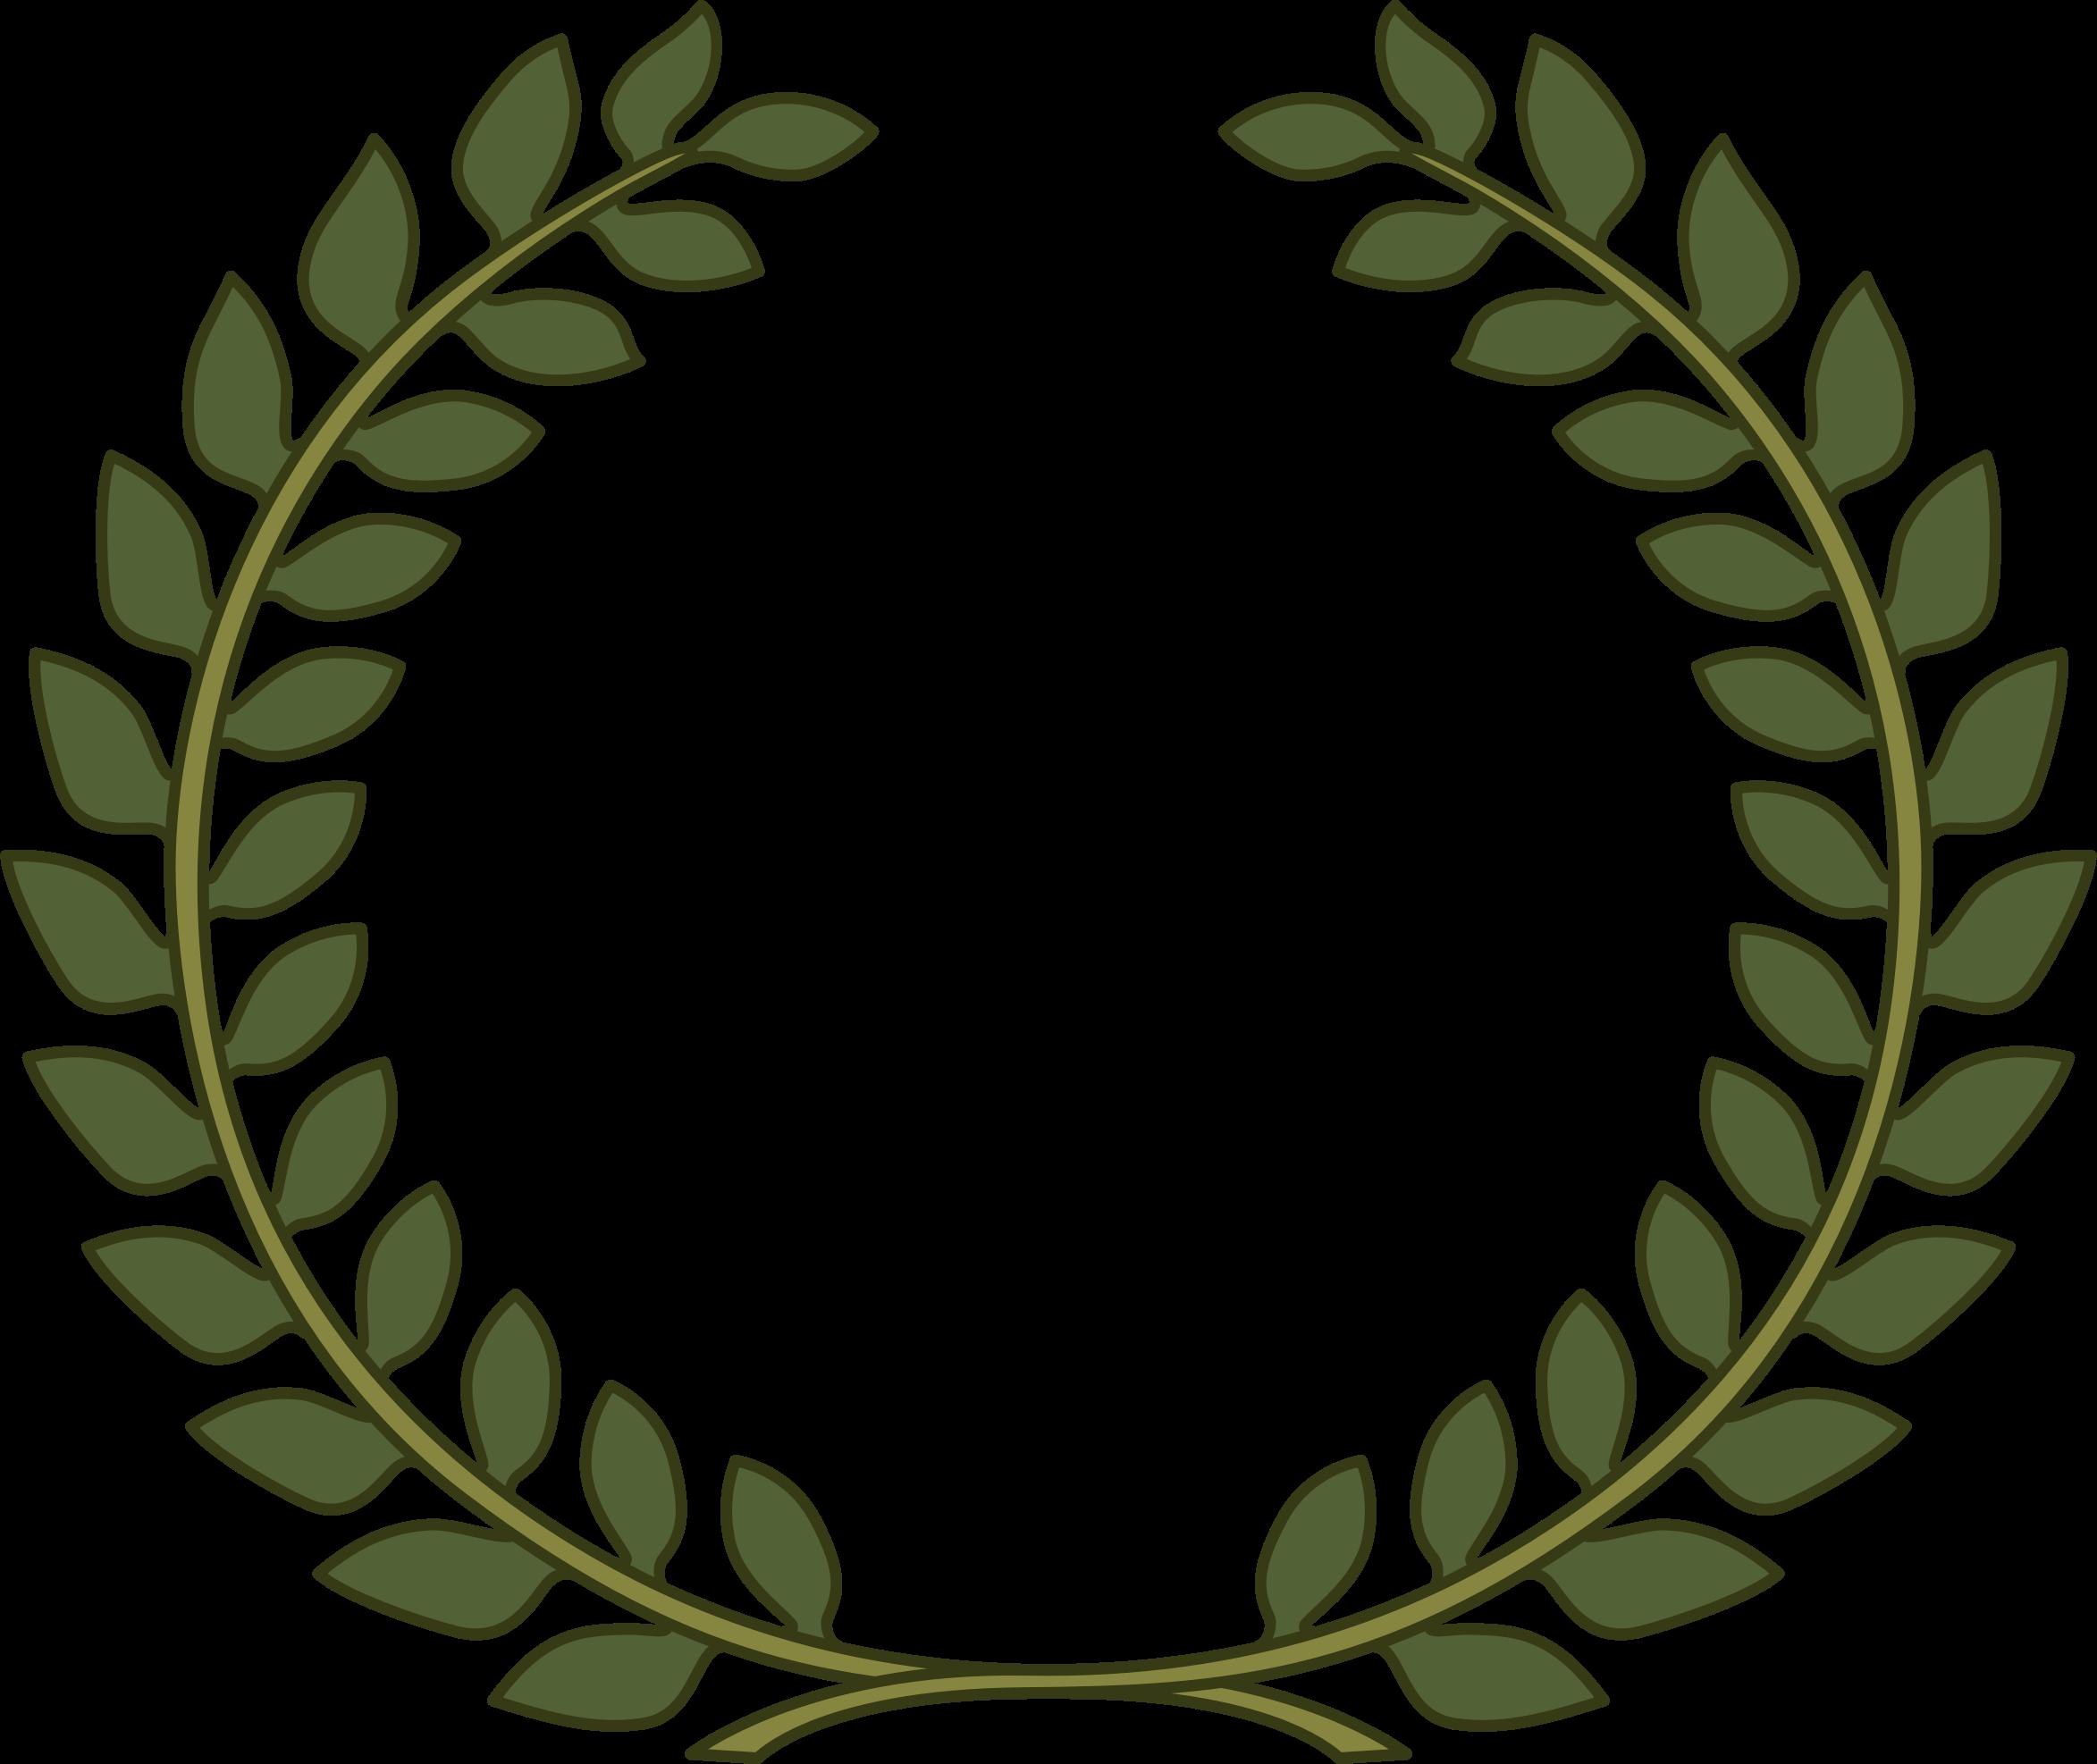 2346x1974 Wreath Transparent Clipart